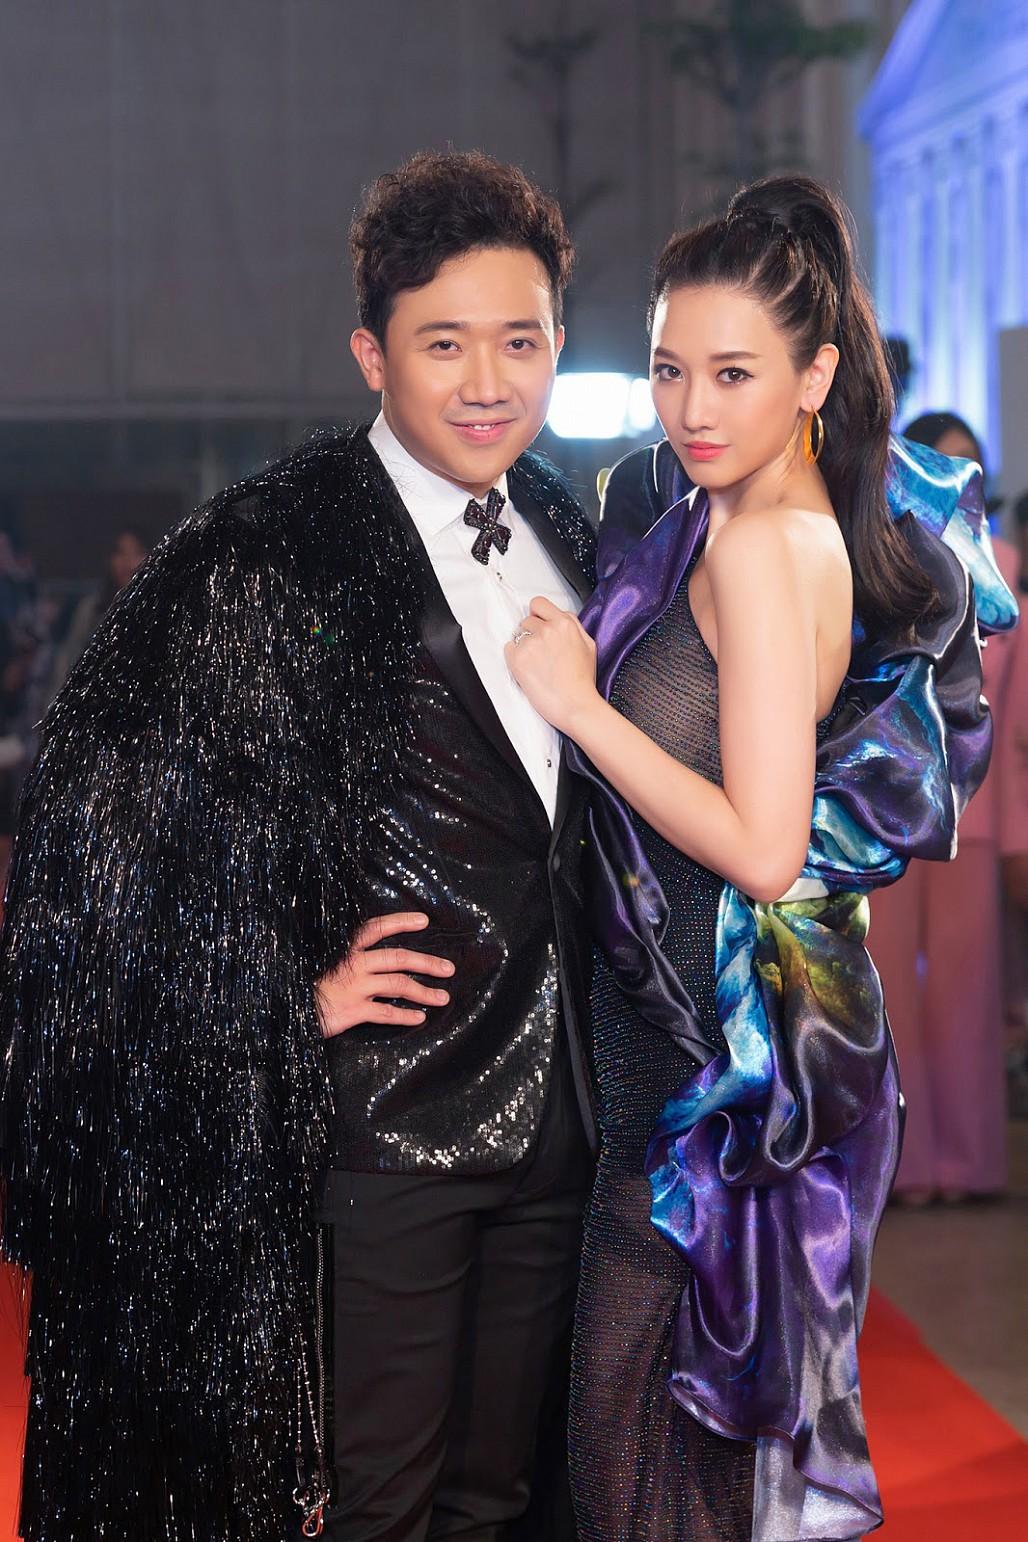 vo-chong-tran-thanh-hari-won-thap-tung-bau-vat-han-quoc-du-show--807874